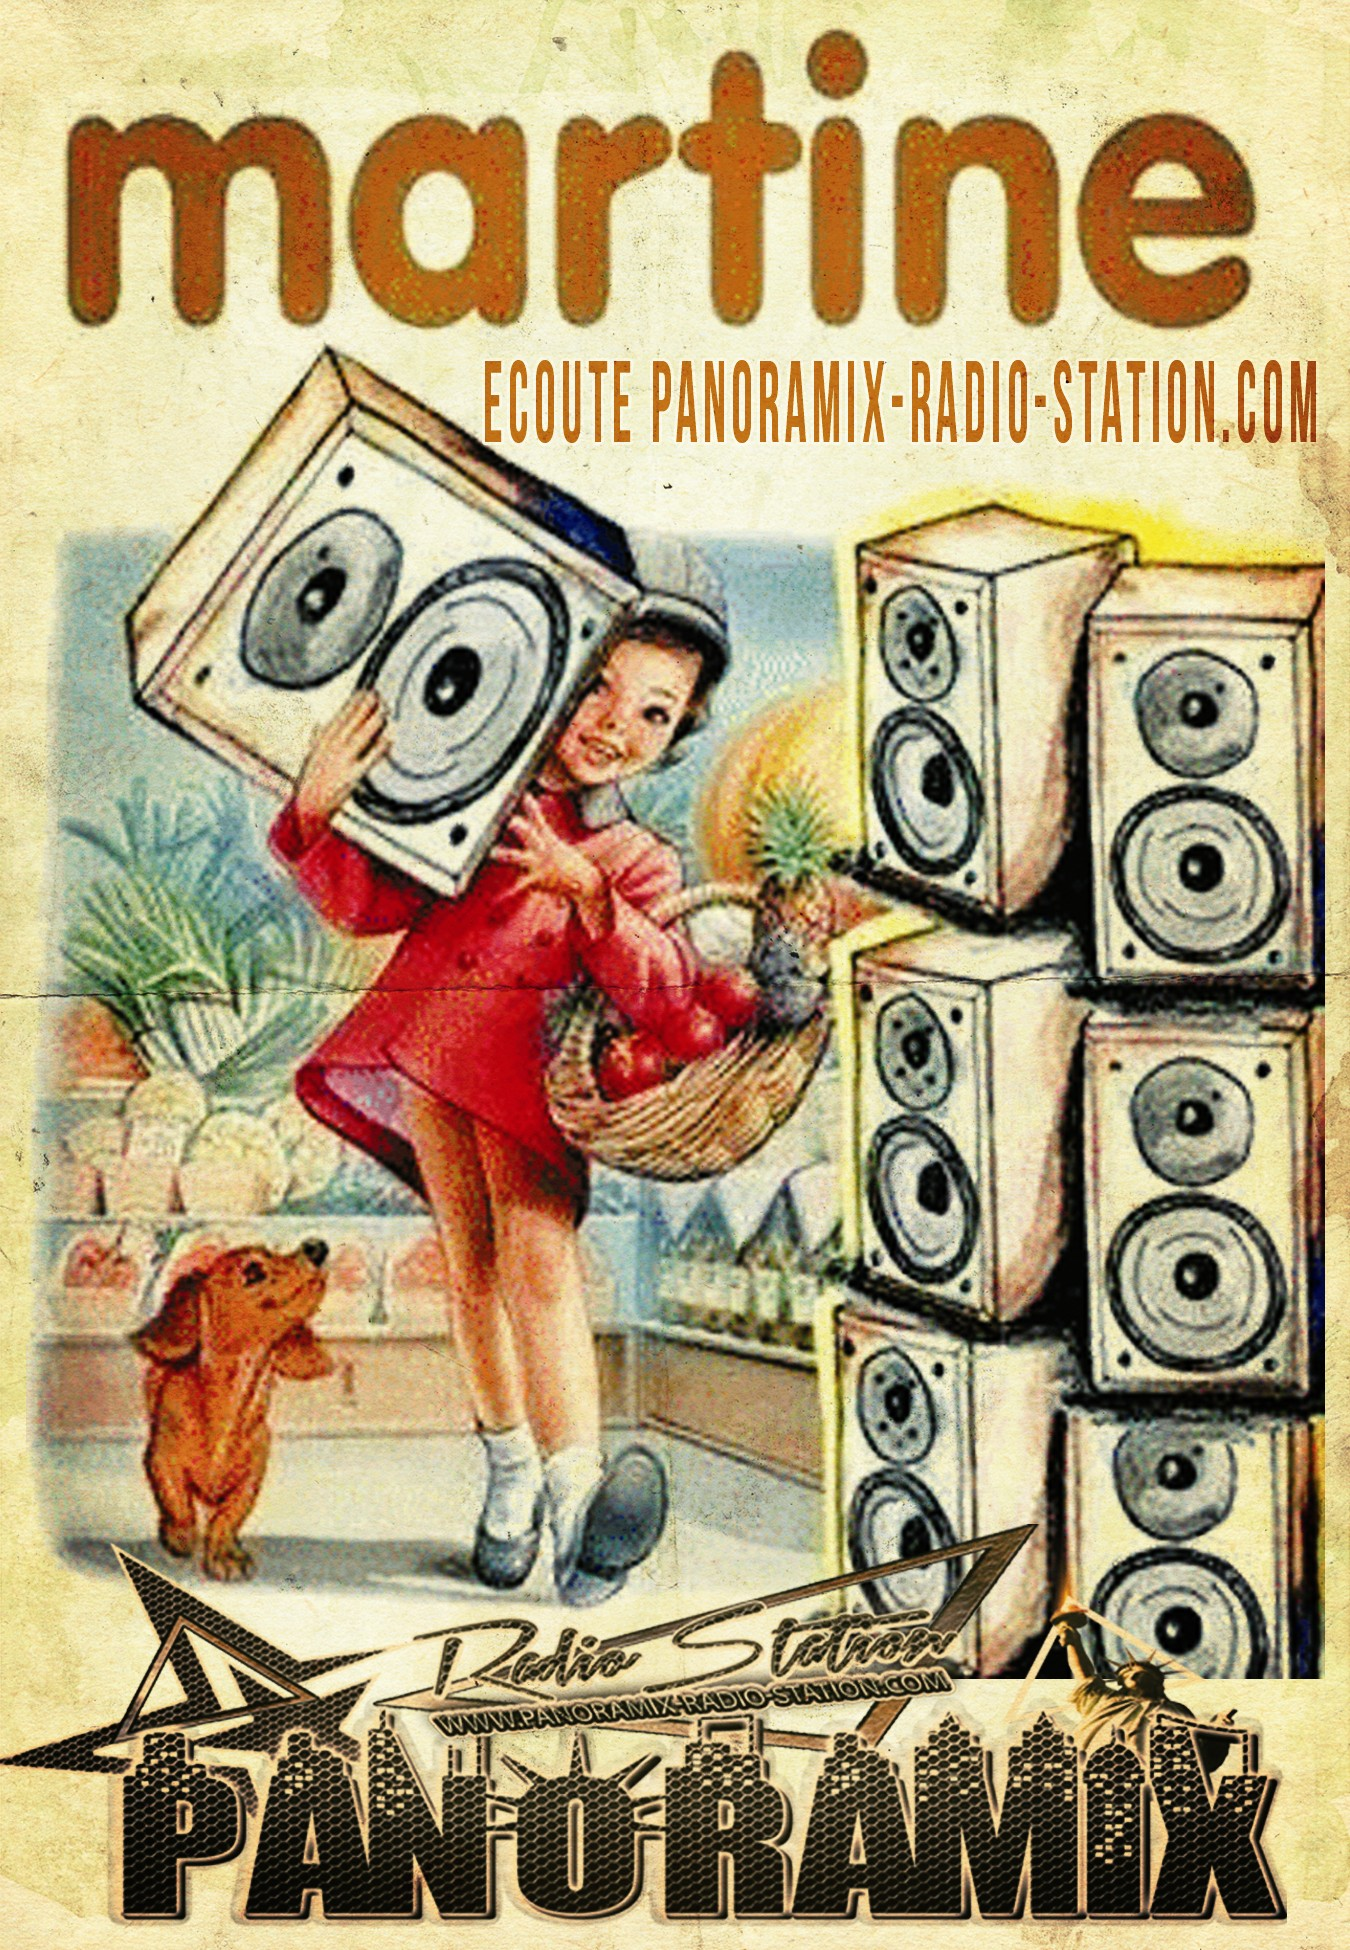 http://panoramix-radio-station.com/wp-content/uploads/2017/07/MARTINE-@-PANORAMIX-RADIO-STATION.jpg